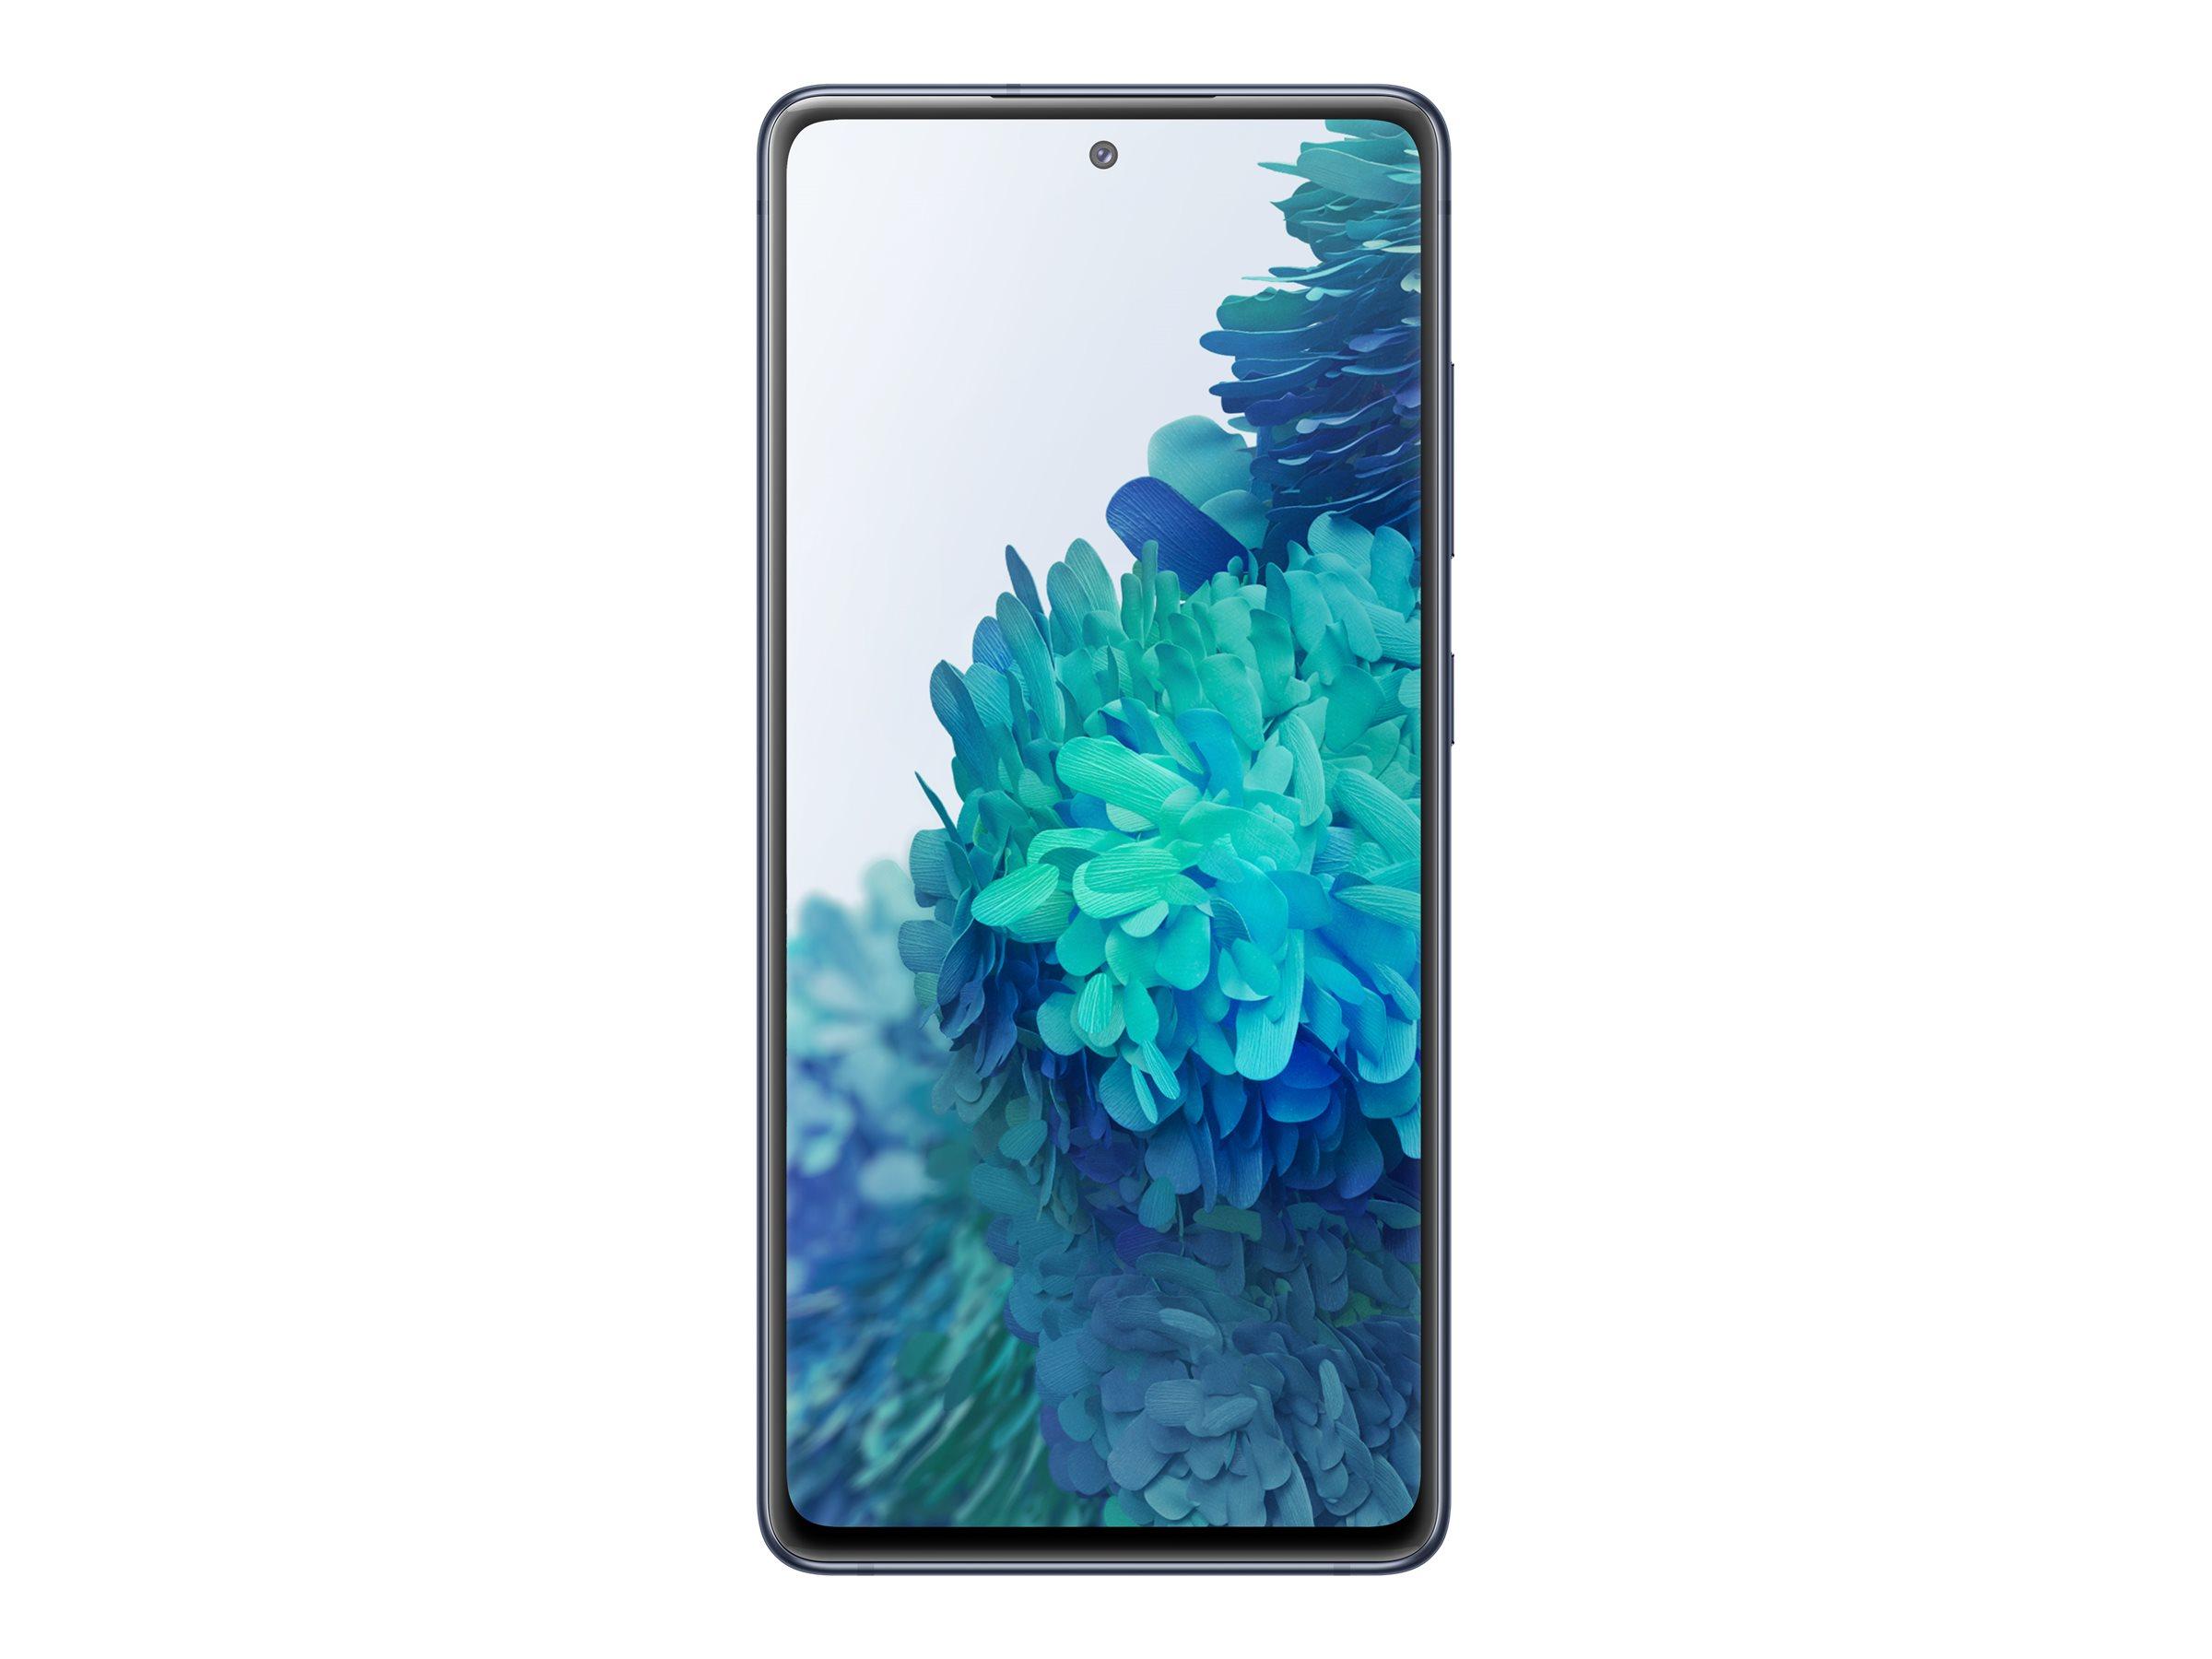 Samsung Galaxy S20 FE 5G - 5G Smartphone - Dual-SIM - RAM 6 GB / 128 GB - microSD slot - OLED-Display